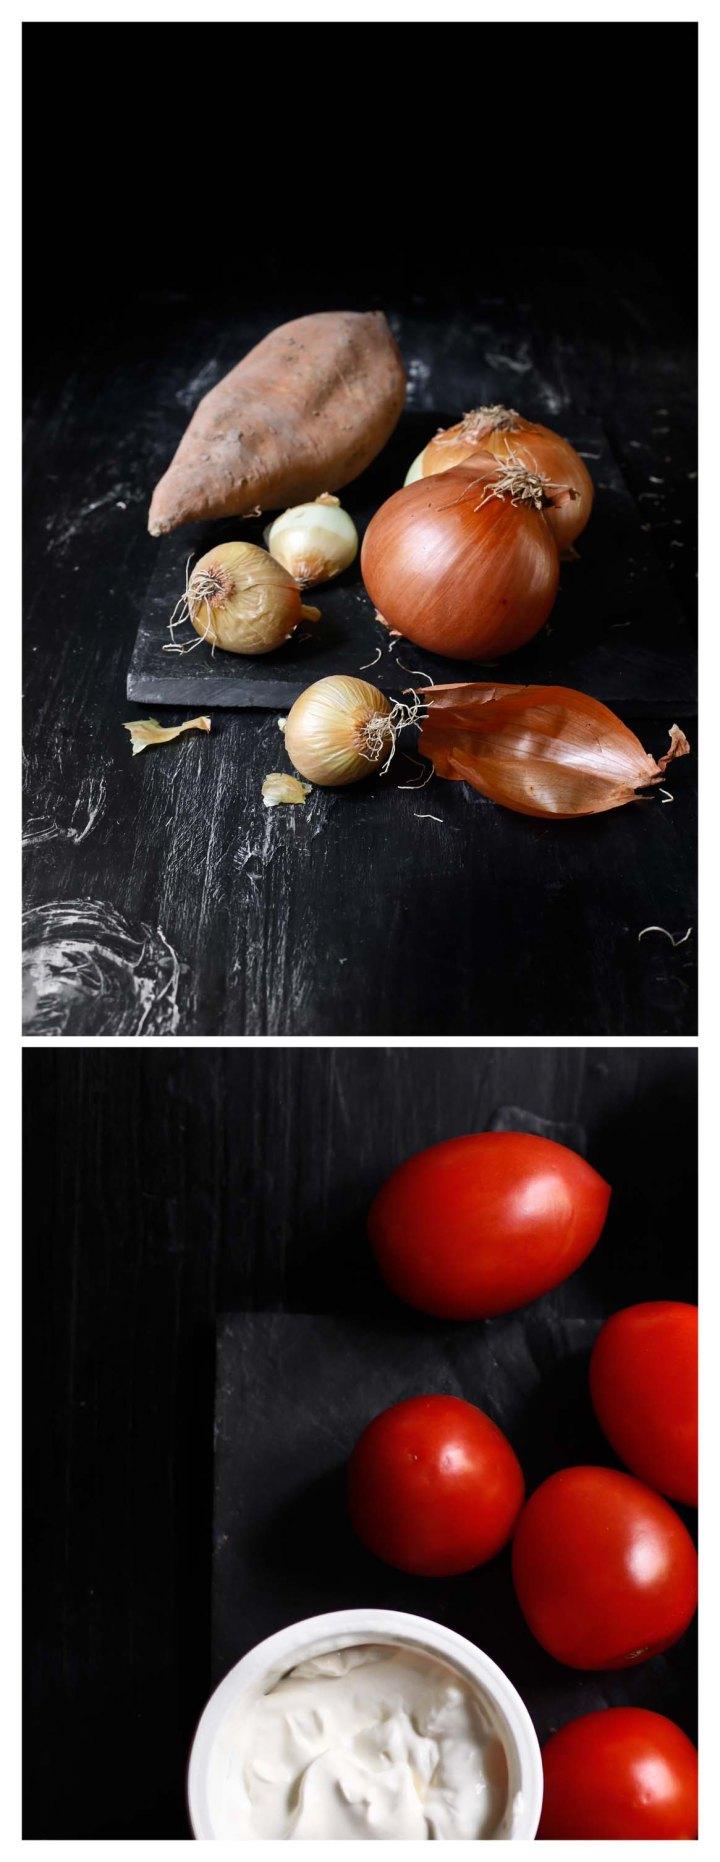 cebolla-batata-tomates-crema-fresca